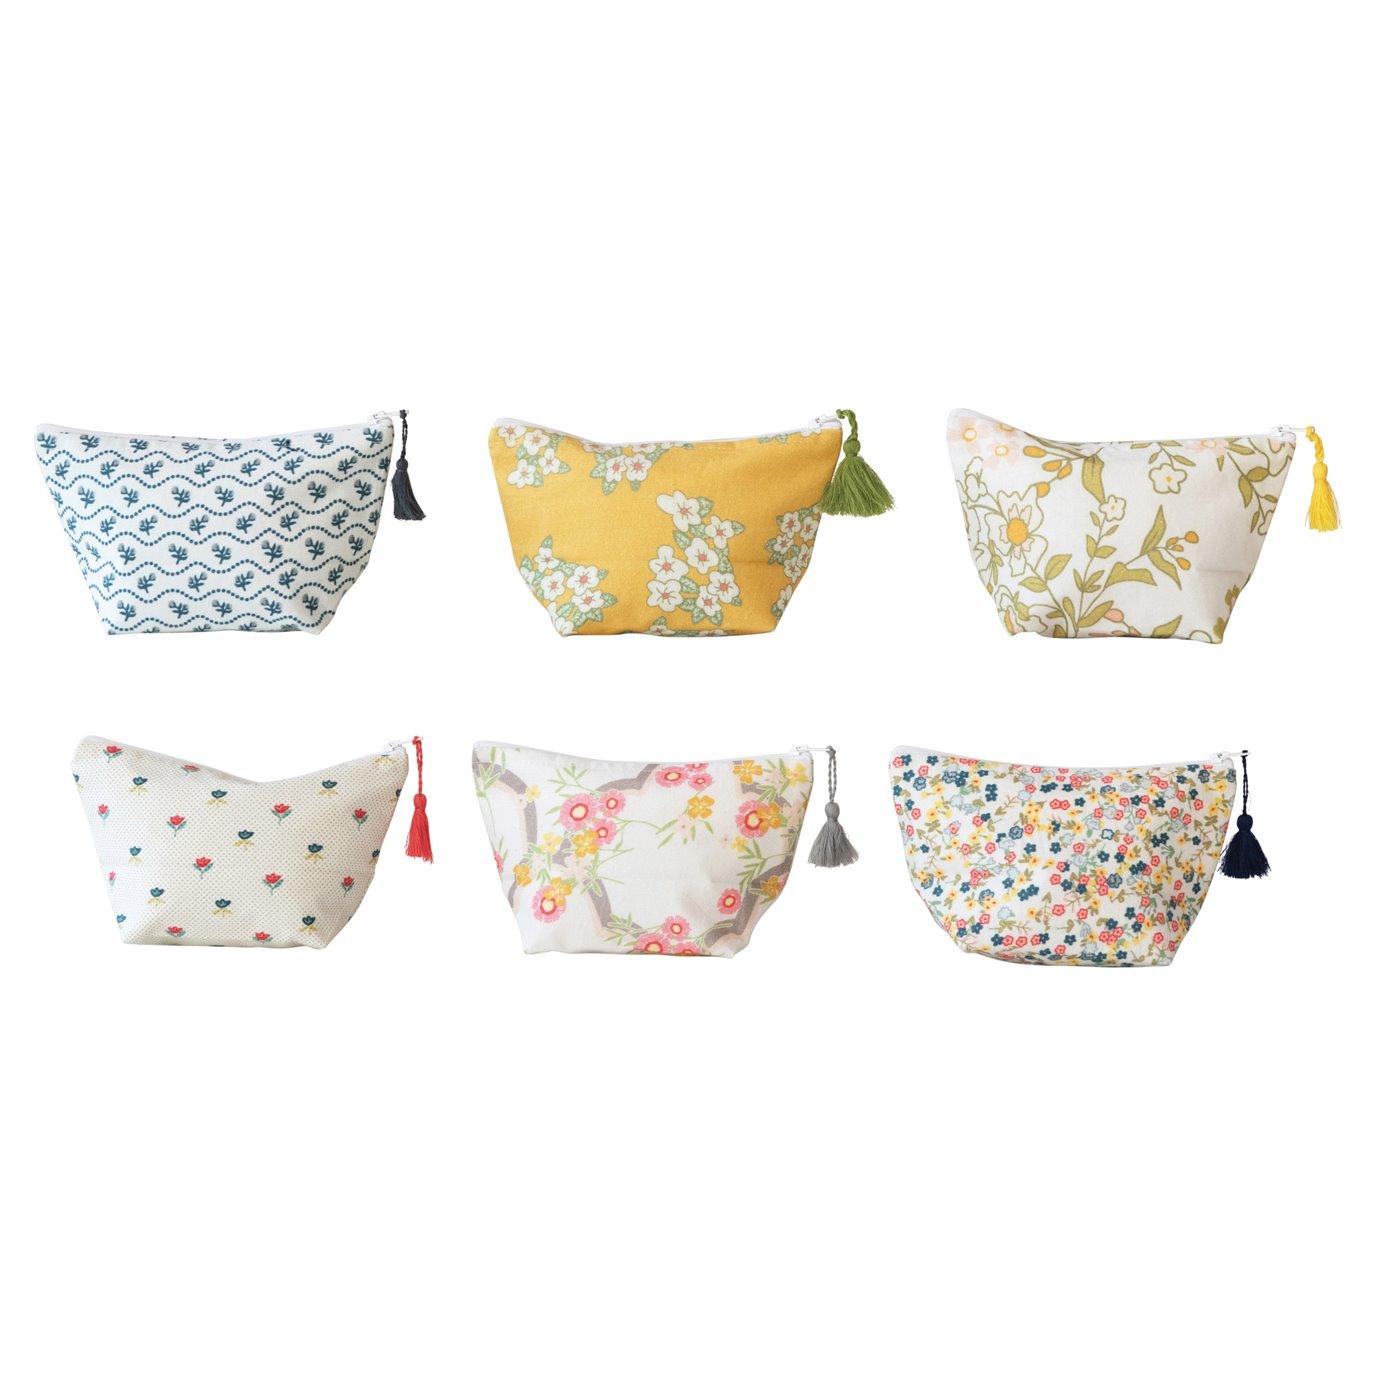 Cotton Printed Una Pouch w/ Tassel & Interior Coating, 6 Styles ©